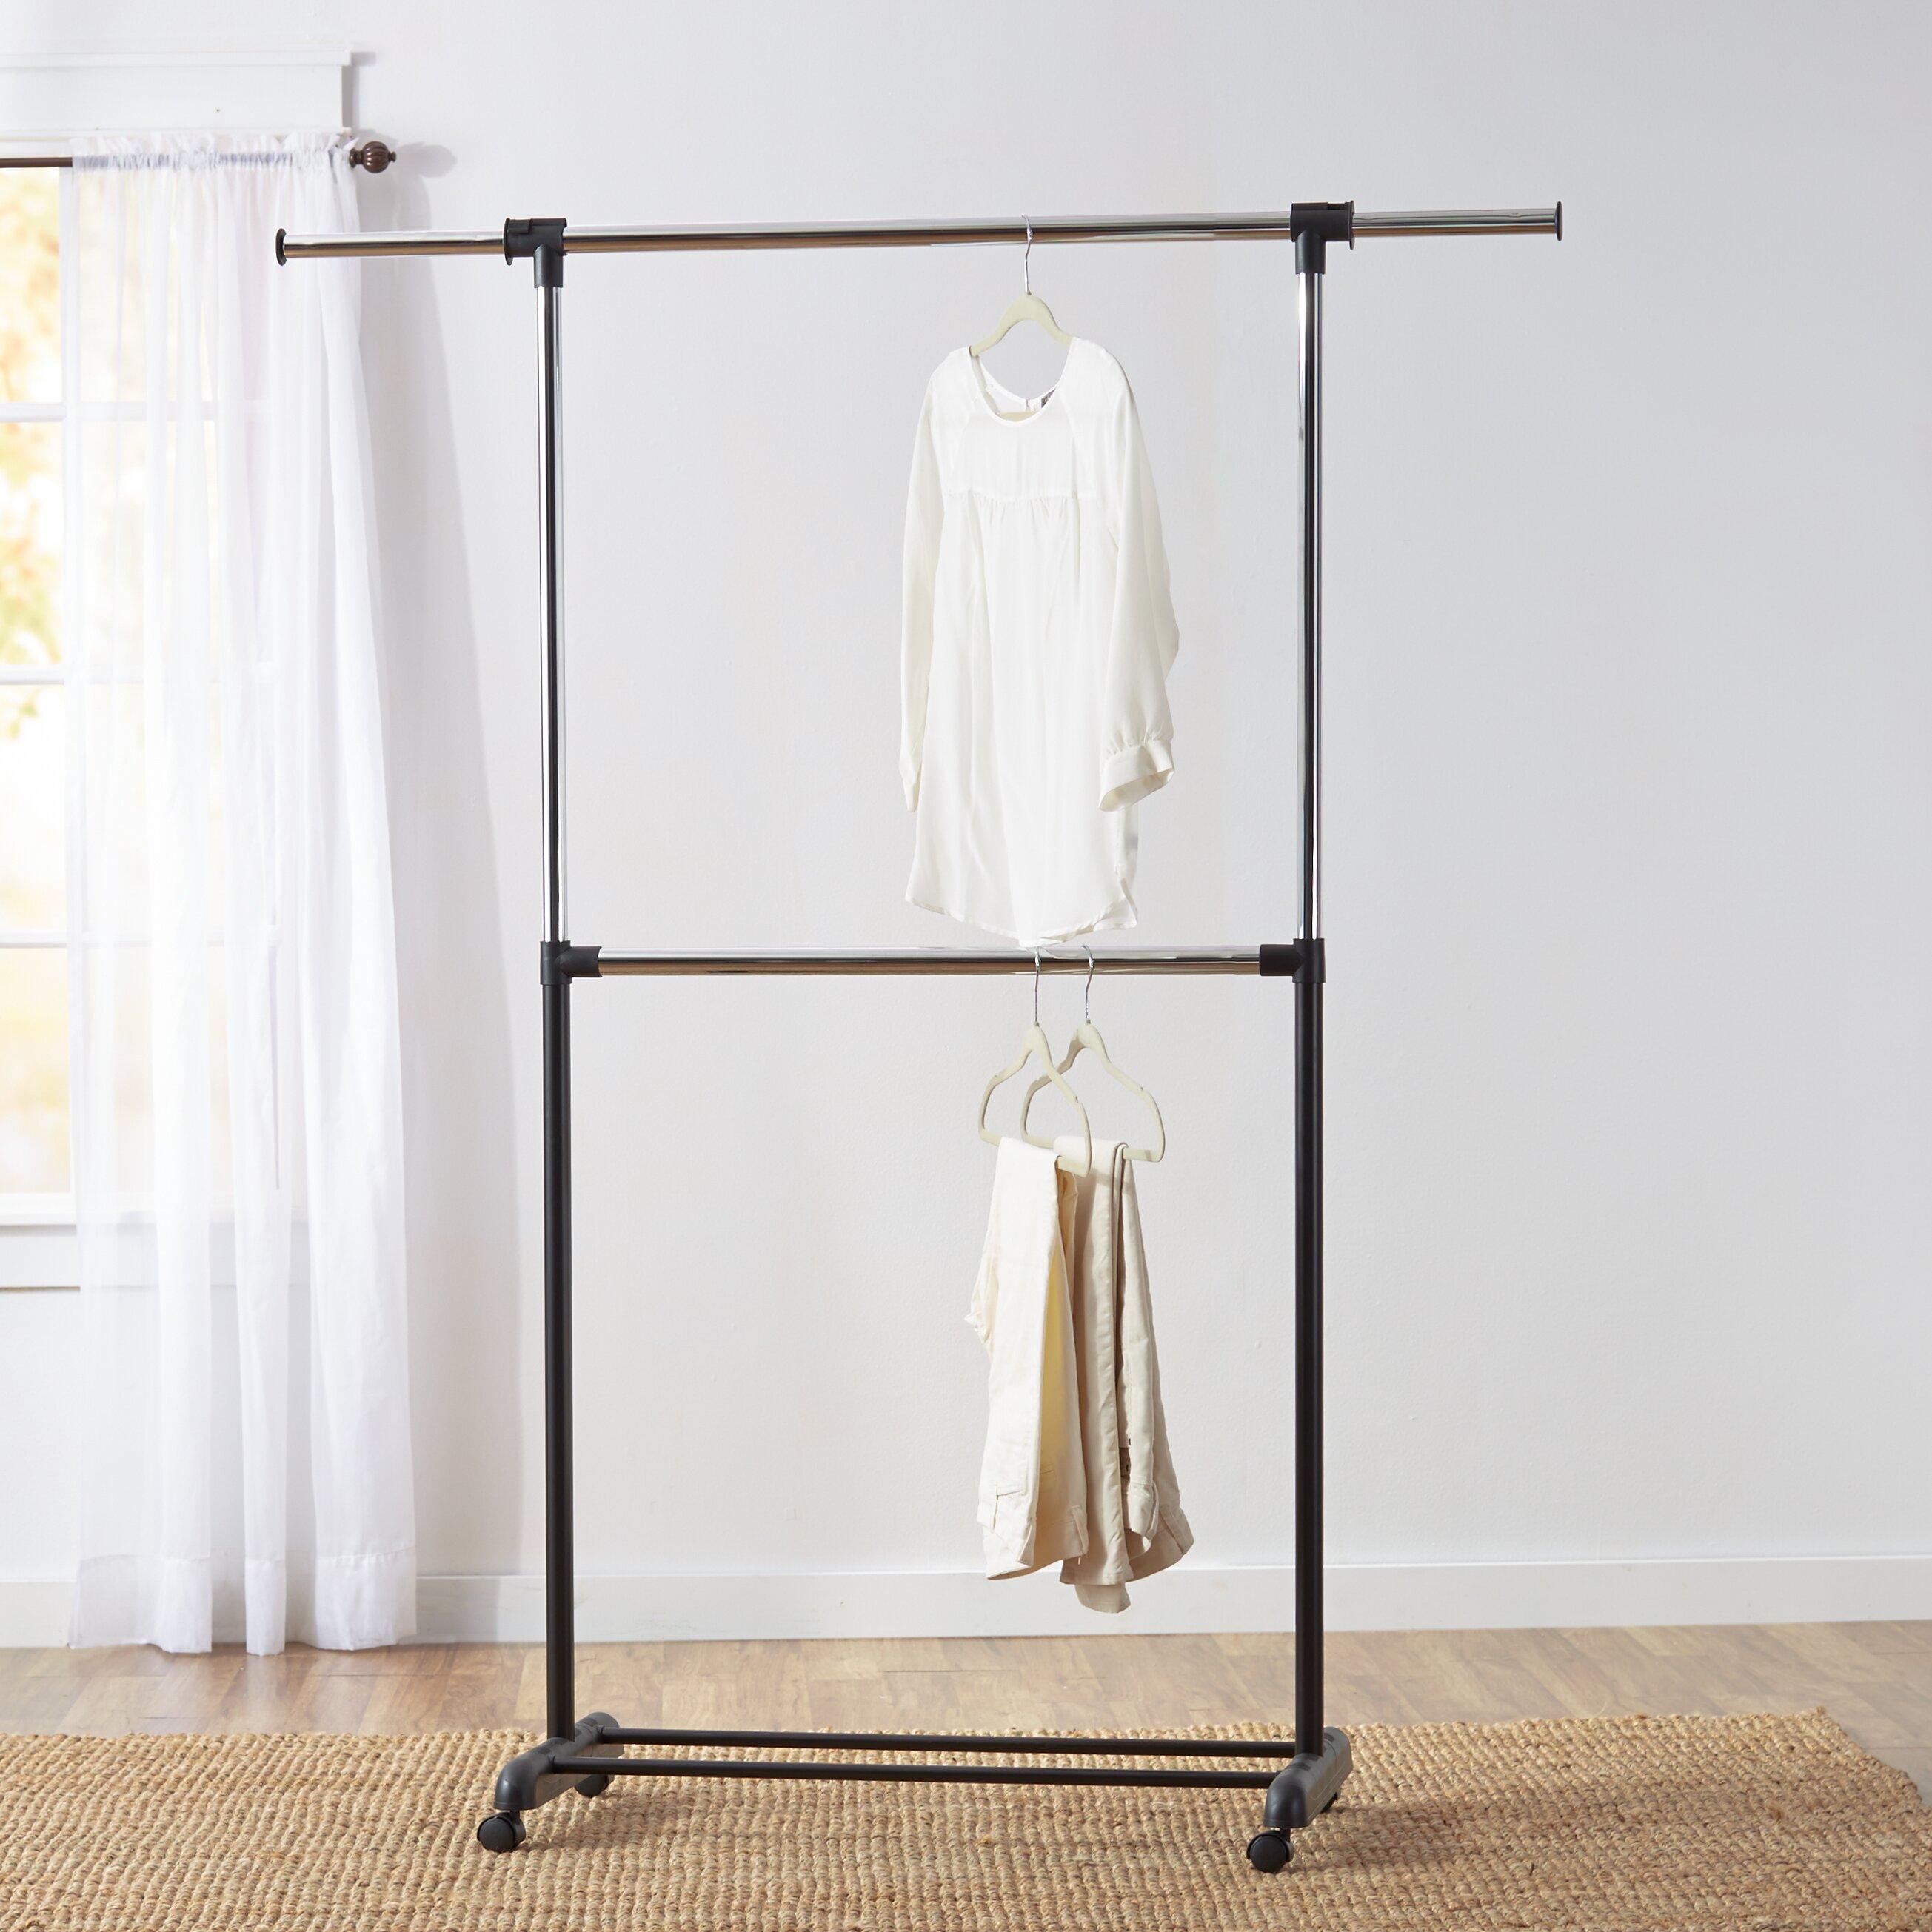 wayfair basics wayfair basics adjustable garment rack reviews wayfair. Black Bedroom Furniture Sets. Home Design Ideas